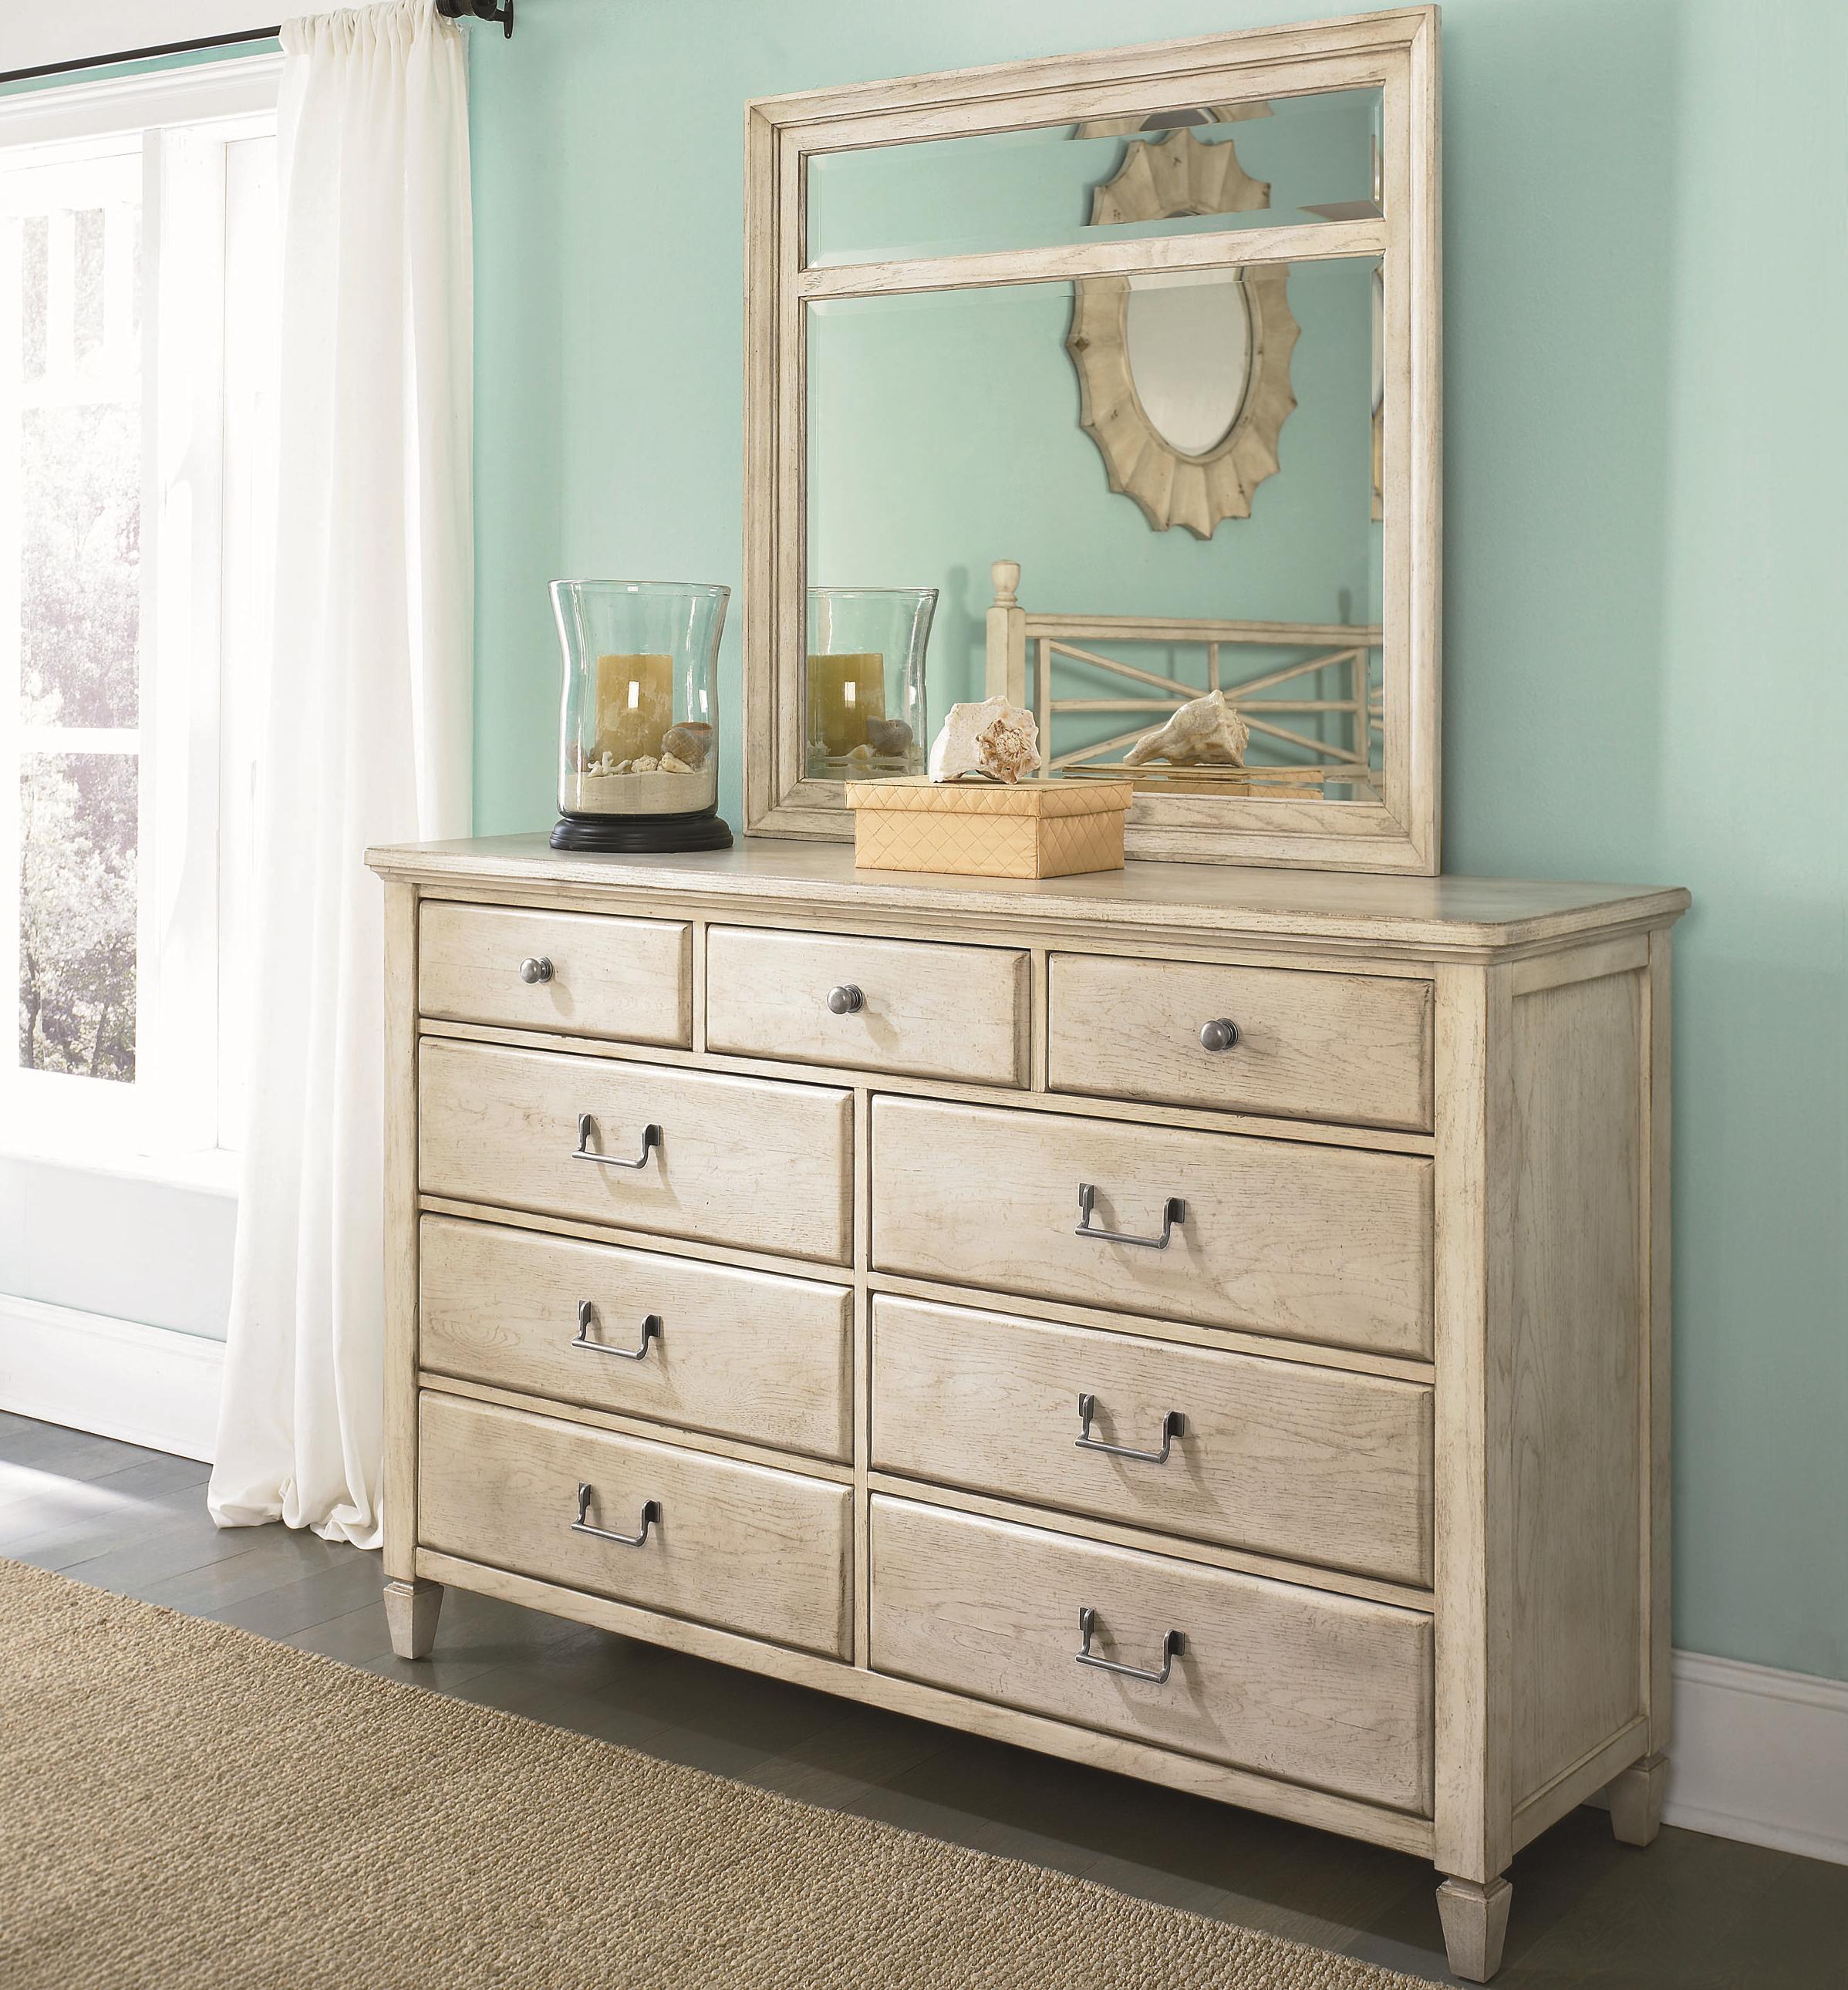 American Drew Americana Home Dresser and Mirror - Item Number: 114-130W+020W